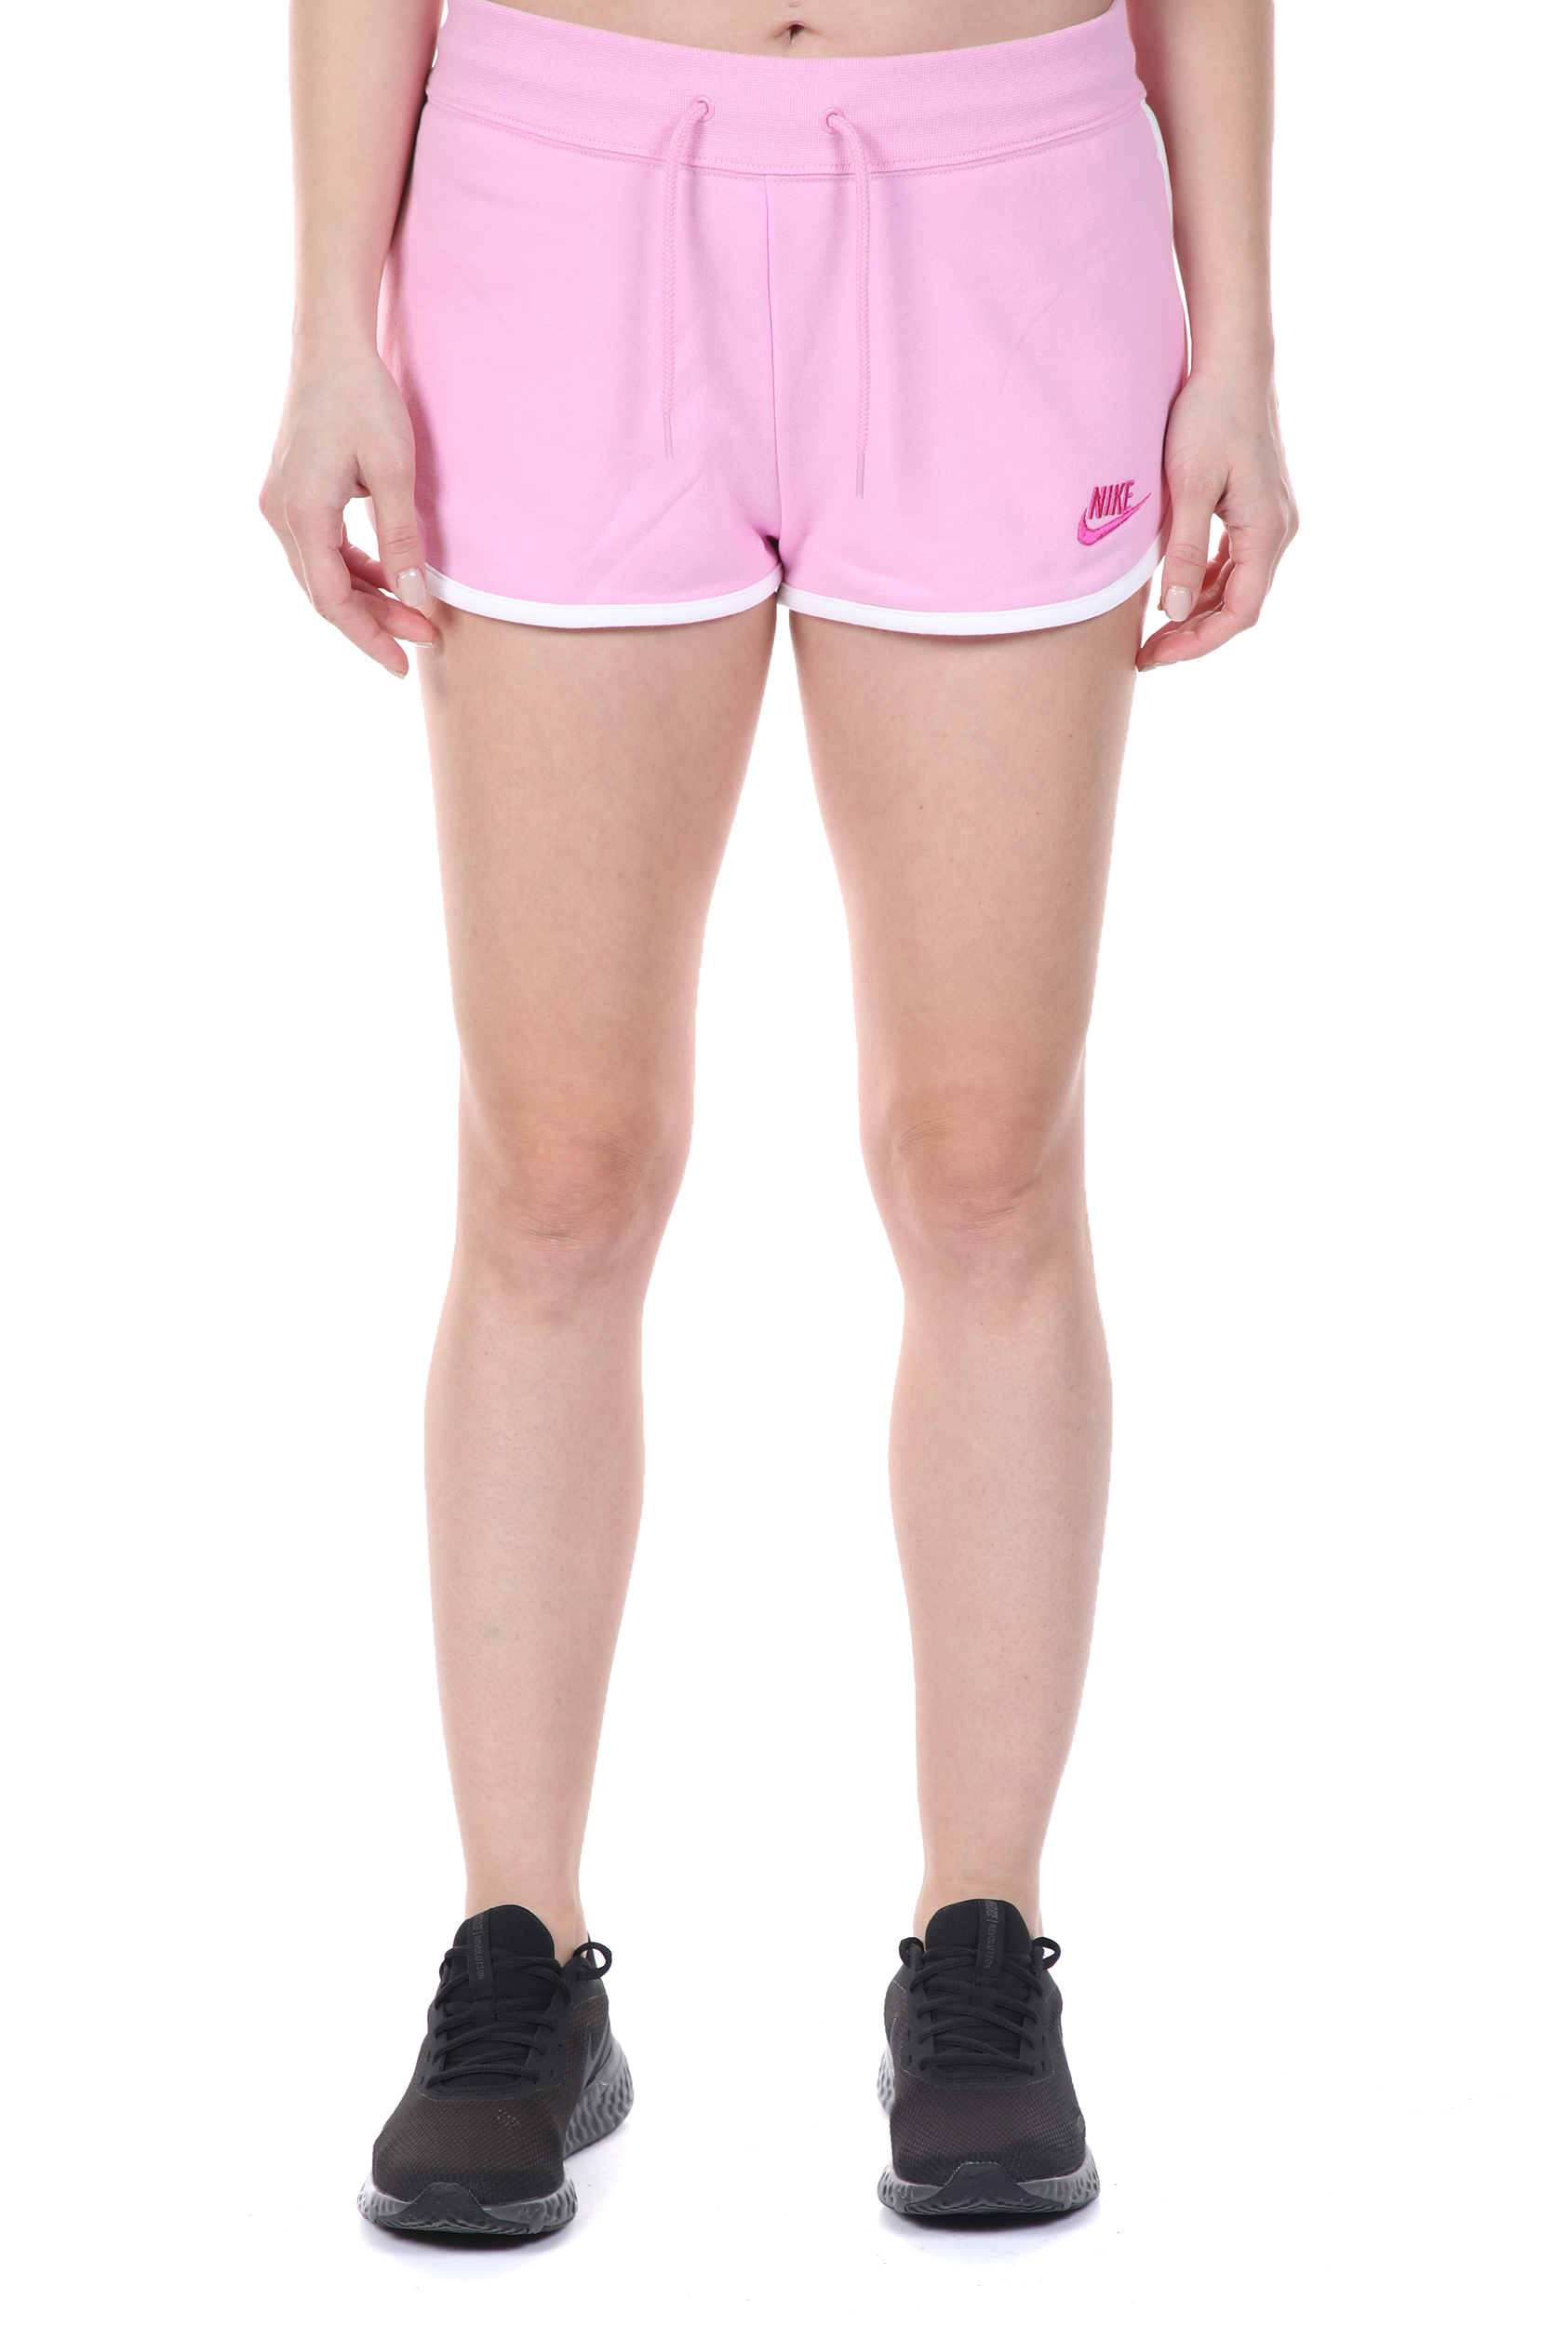 NIKE - Γυναικείο σορτς NSW HRTG SHORT FLC ροζ